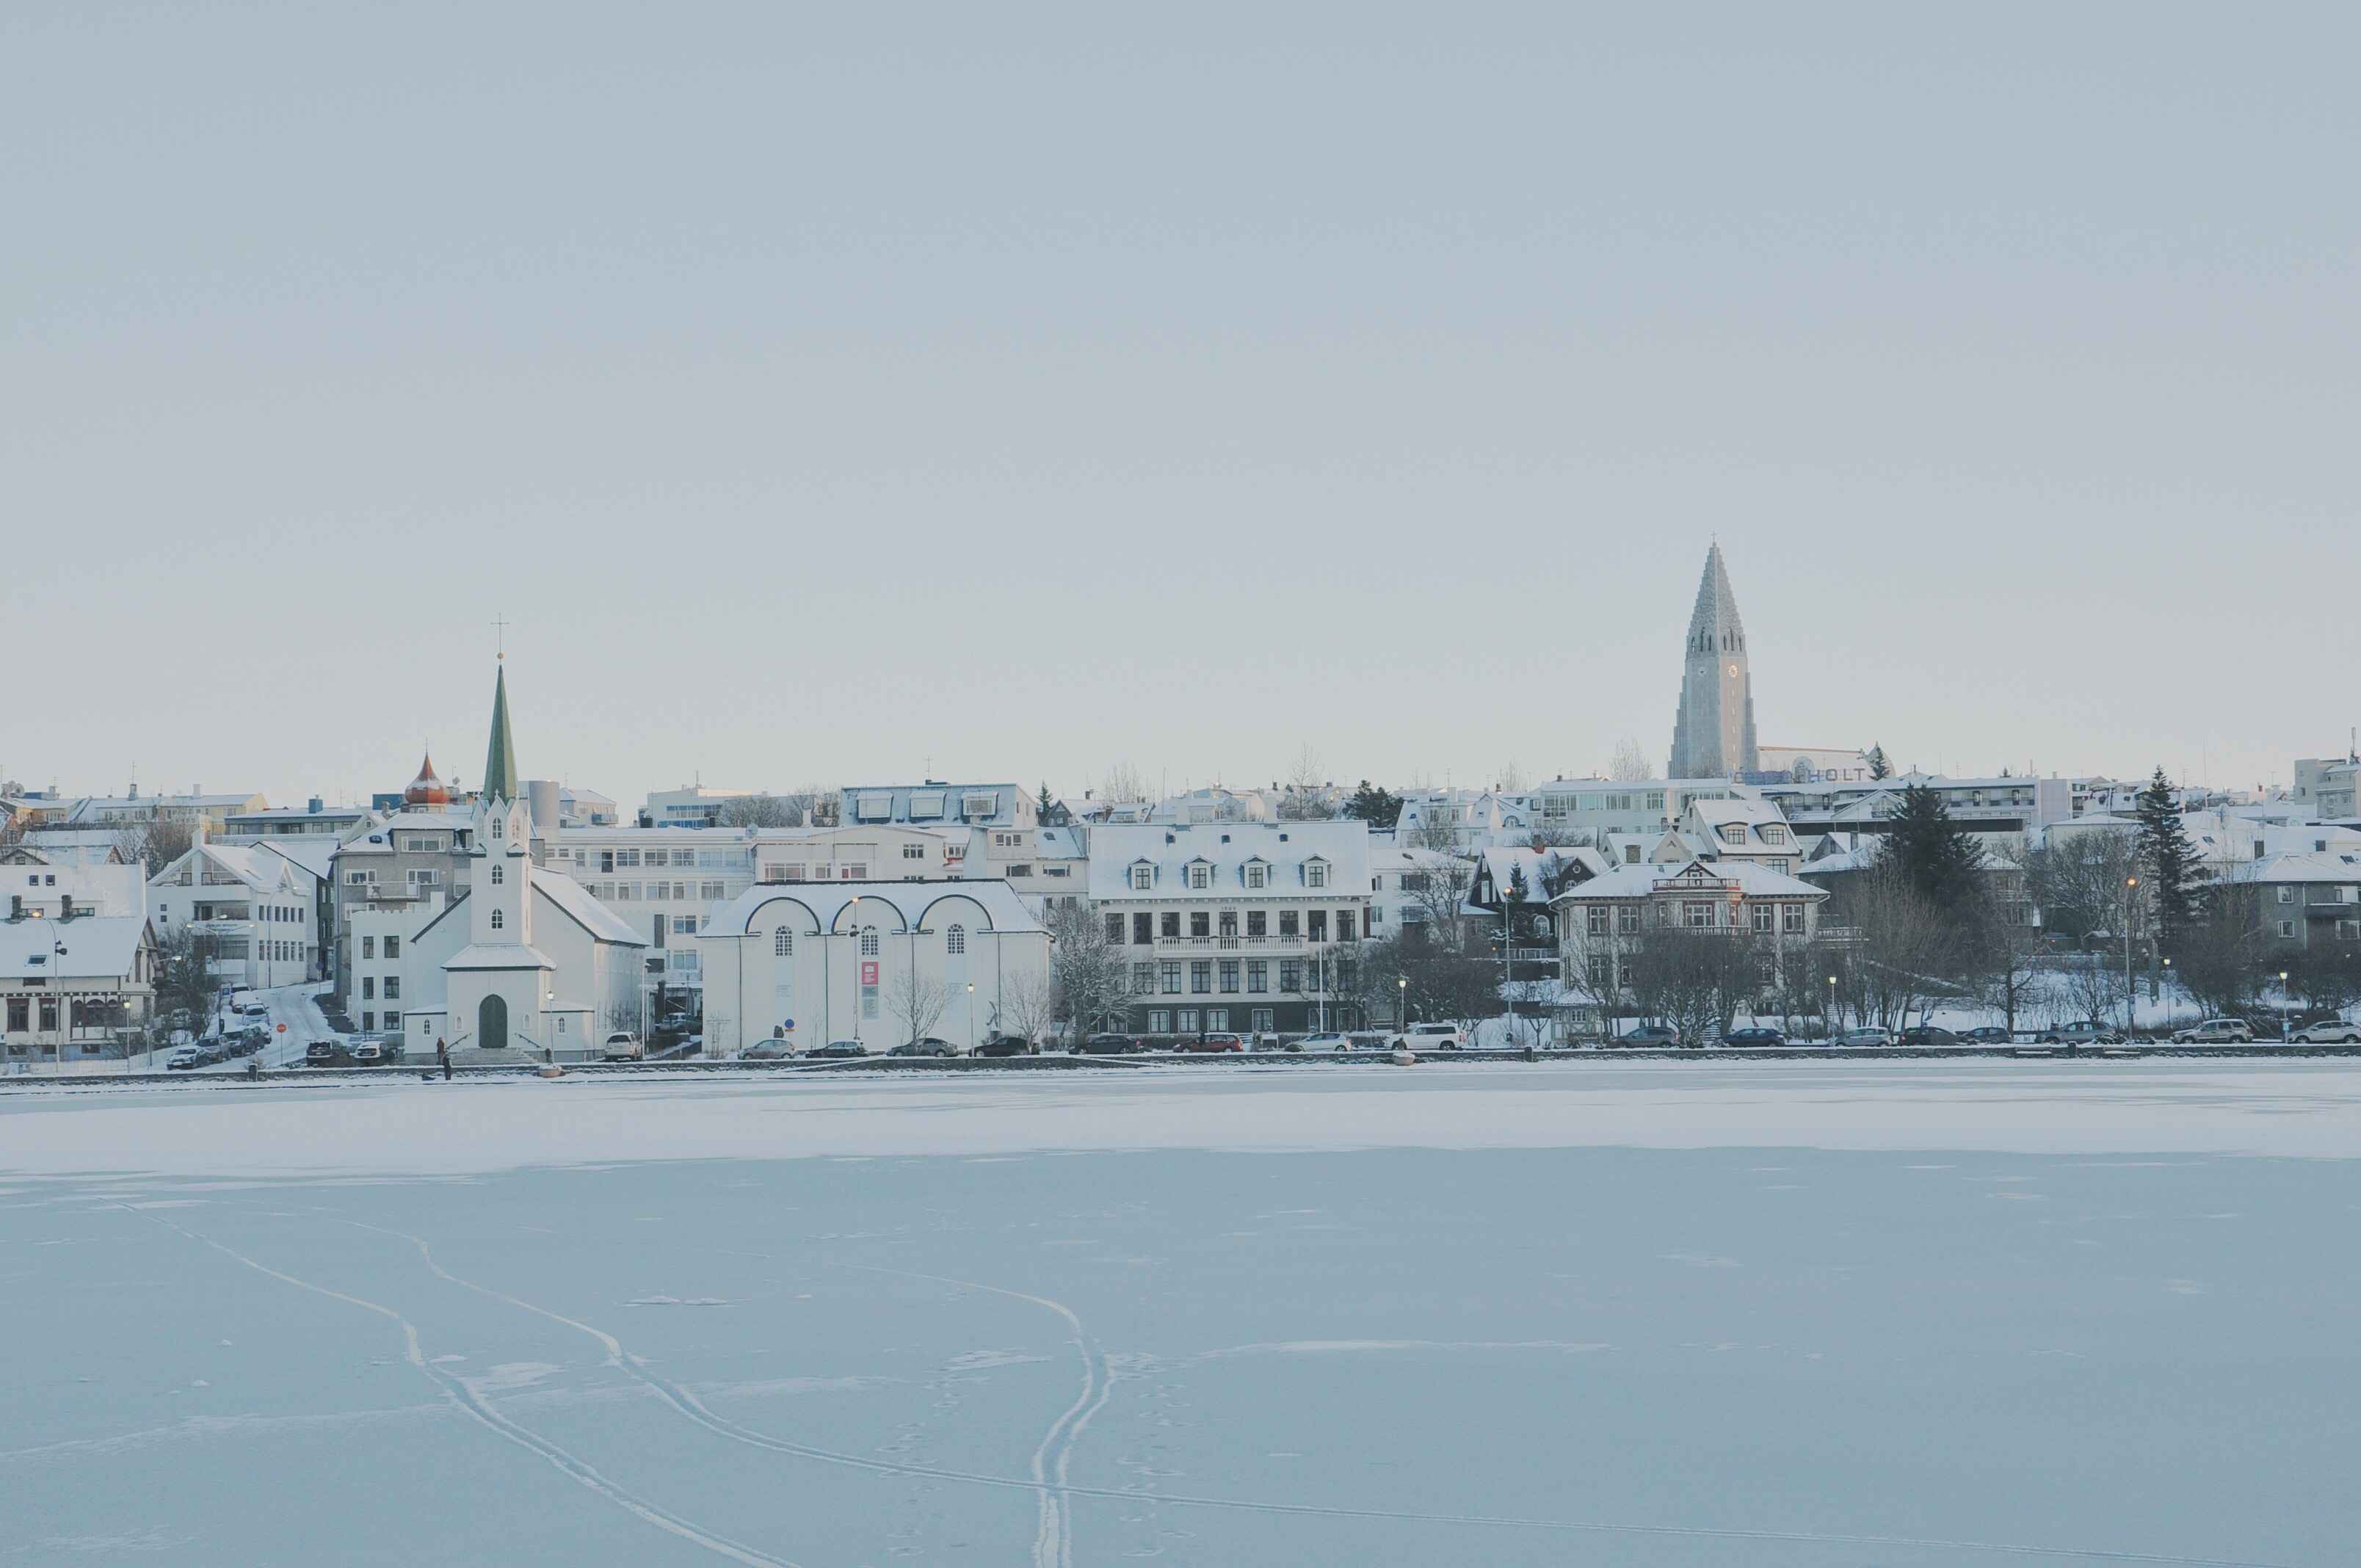 Lake Tjörnin in central Reykjavík regularly freezes over in the winter.